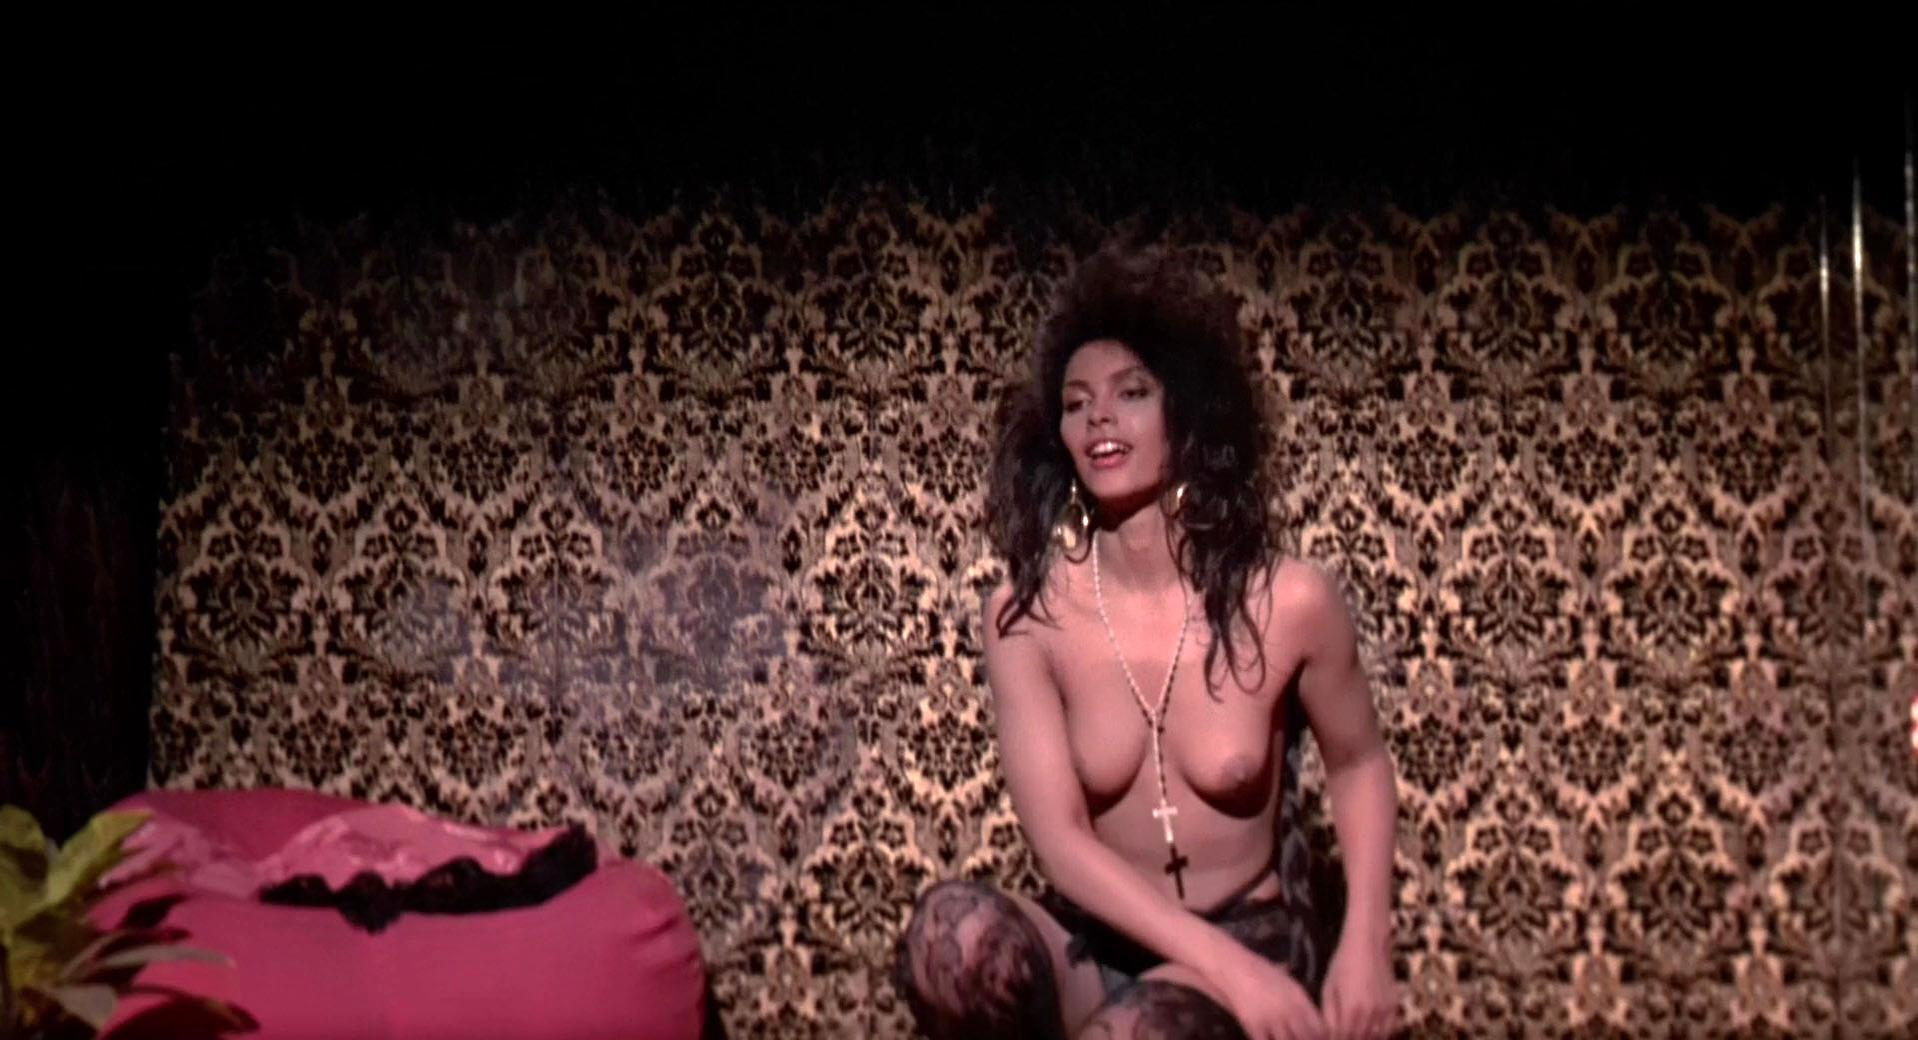 Vanity Nude 63